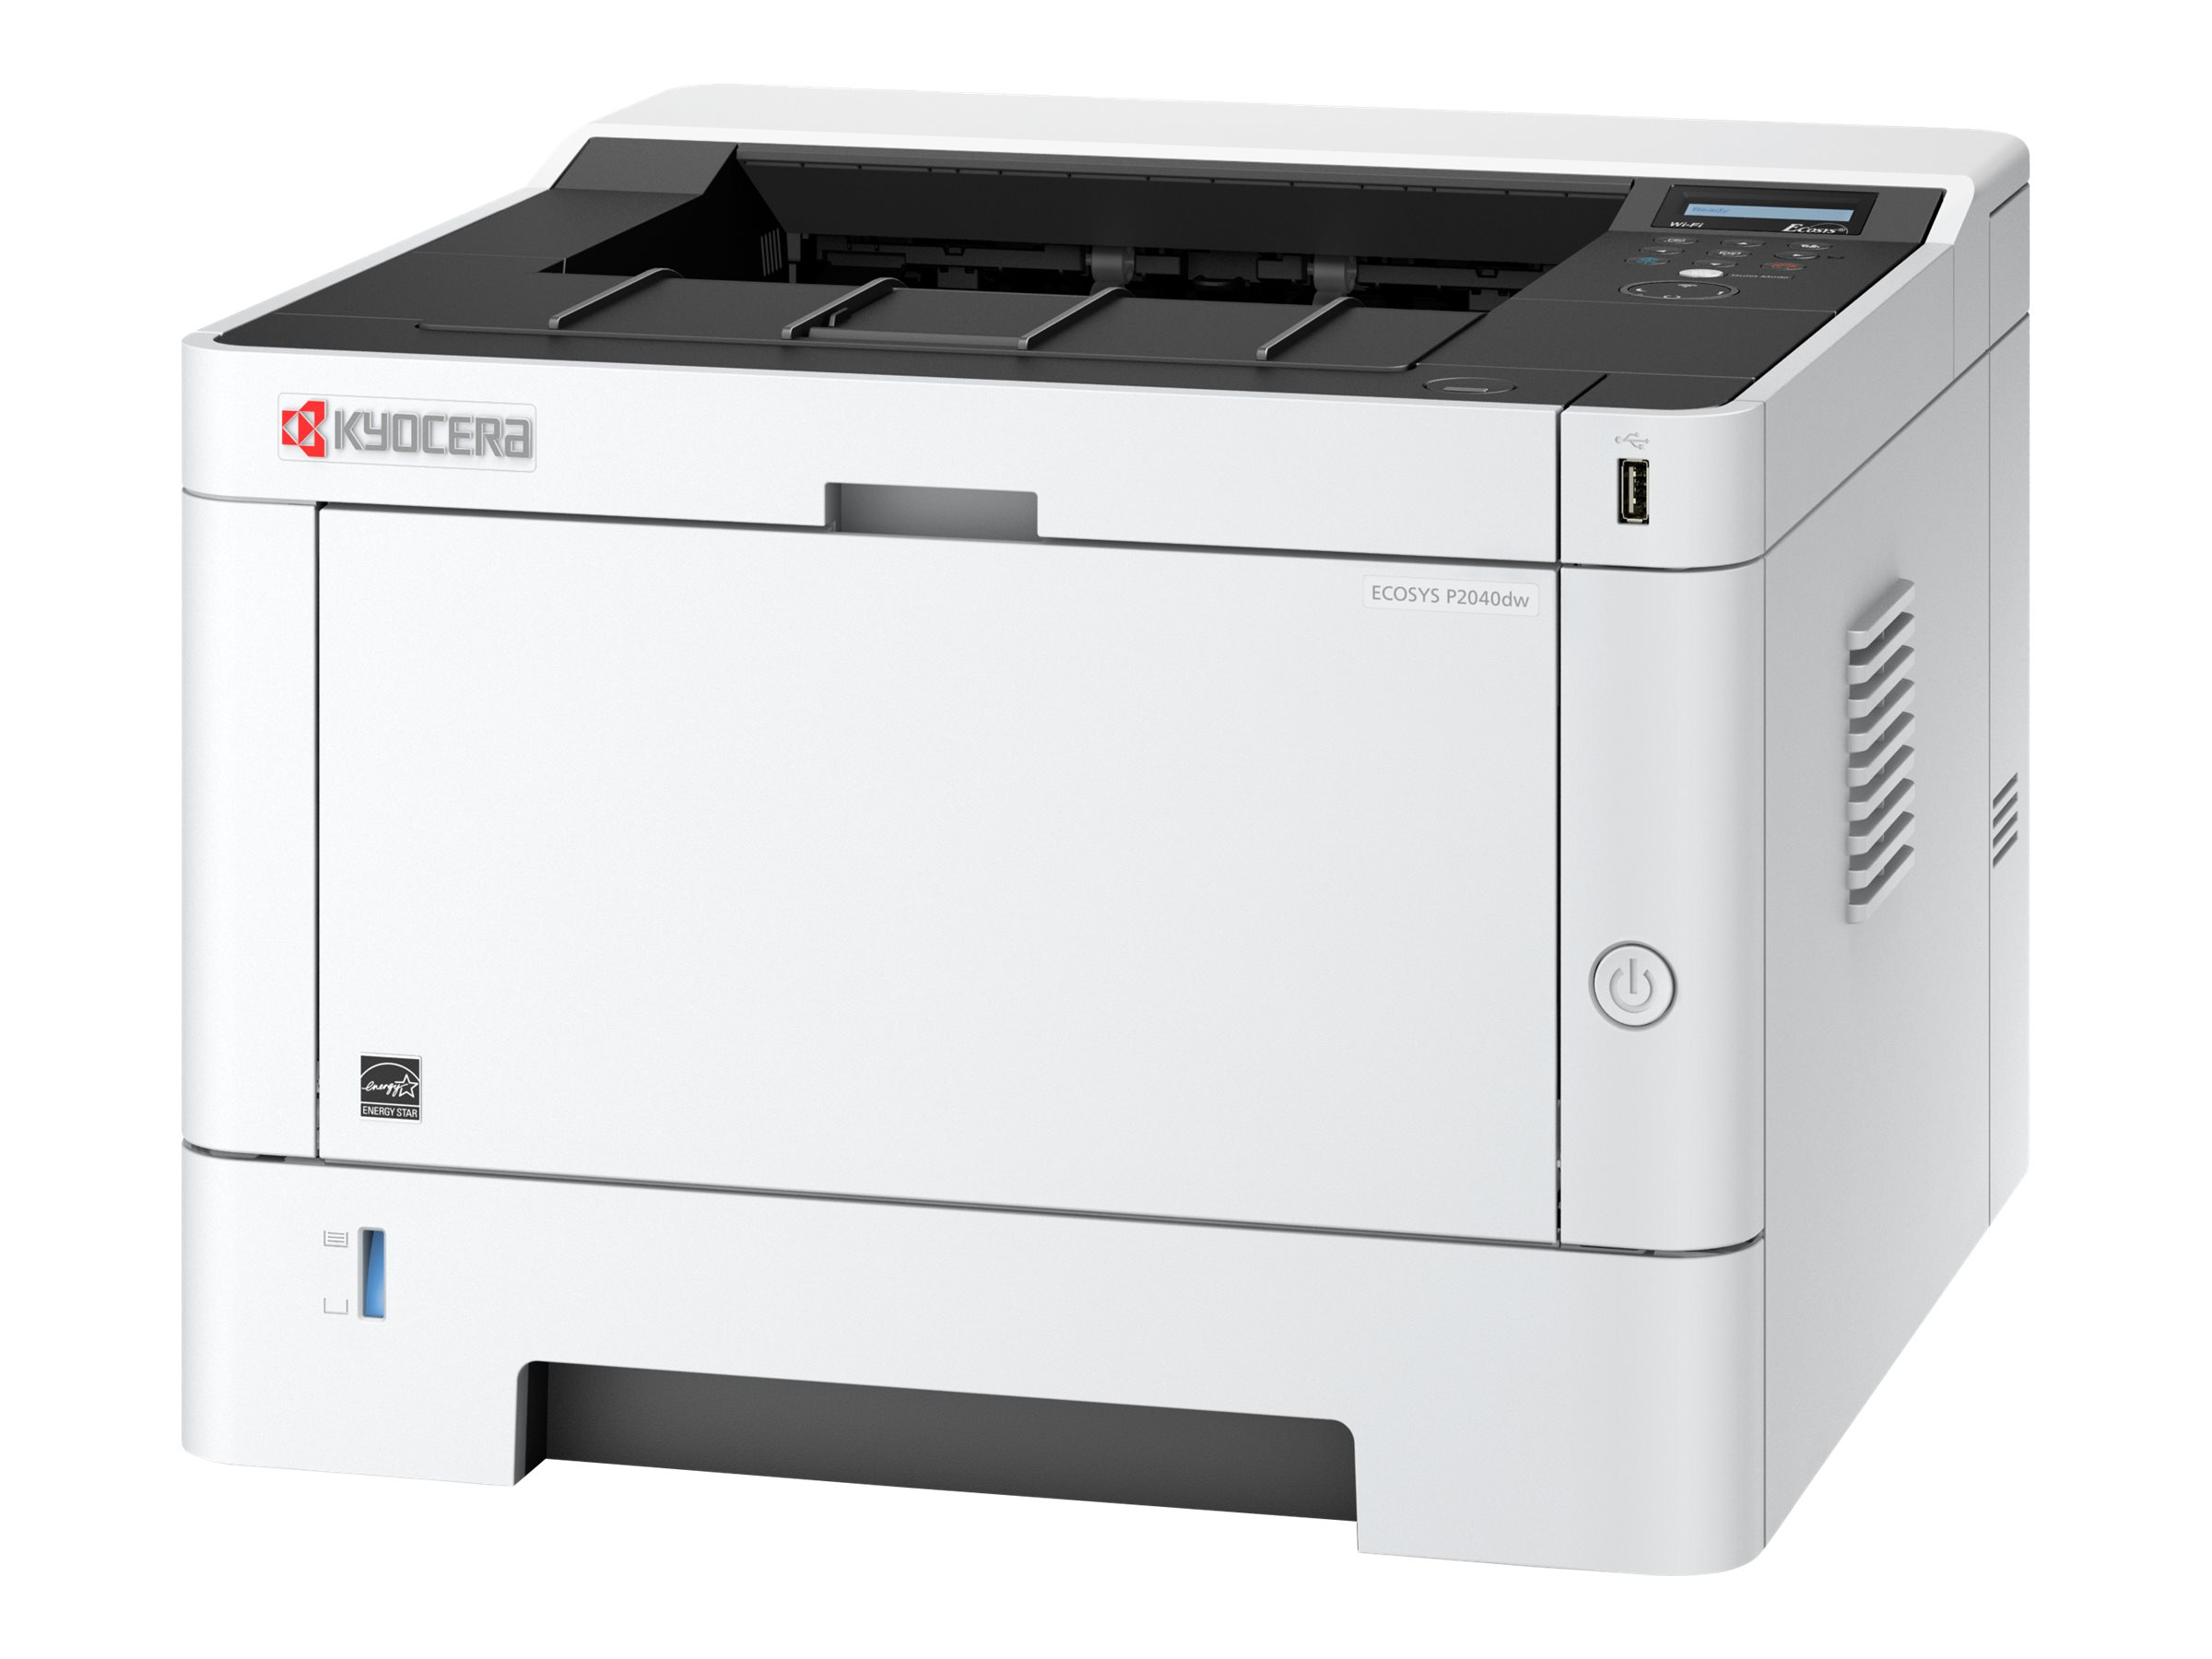 Kyocera ECOSYS P2040DW/KL3 - Drucker